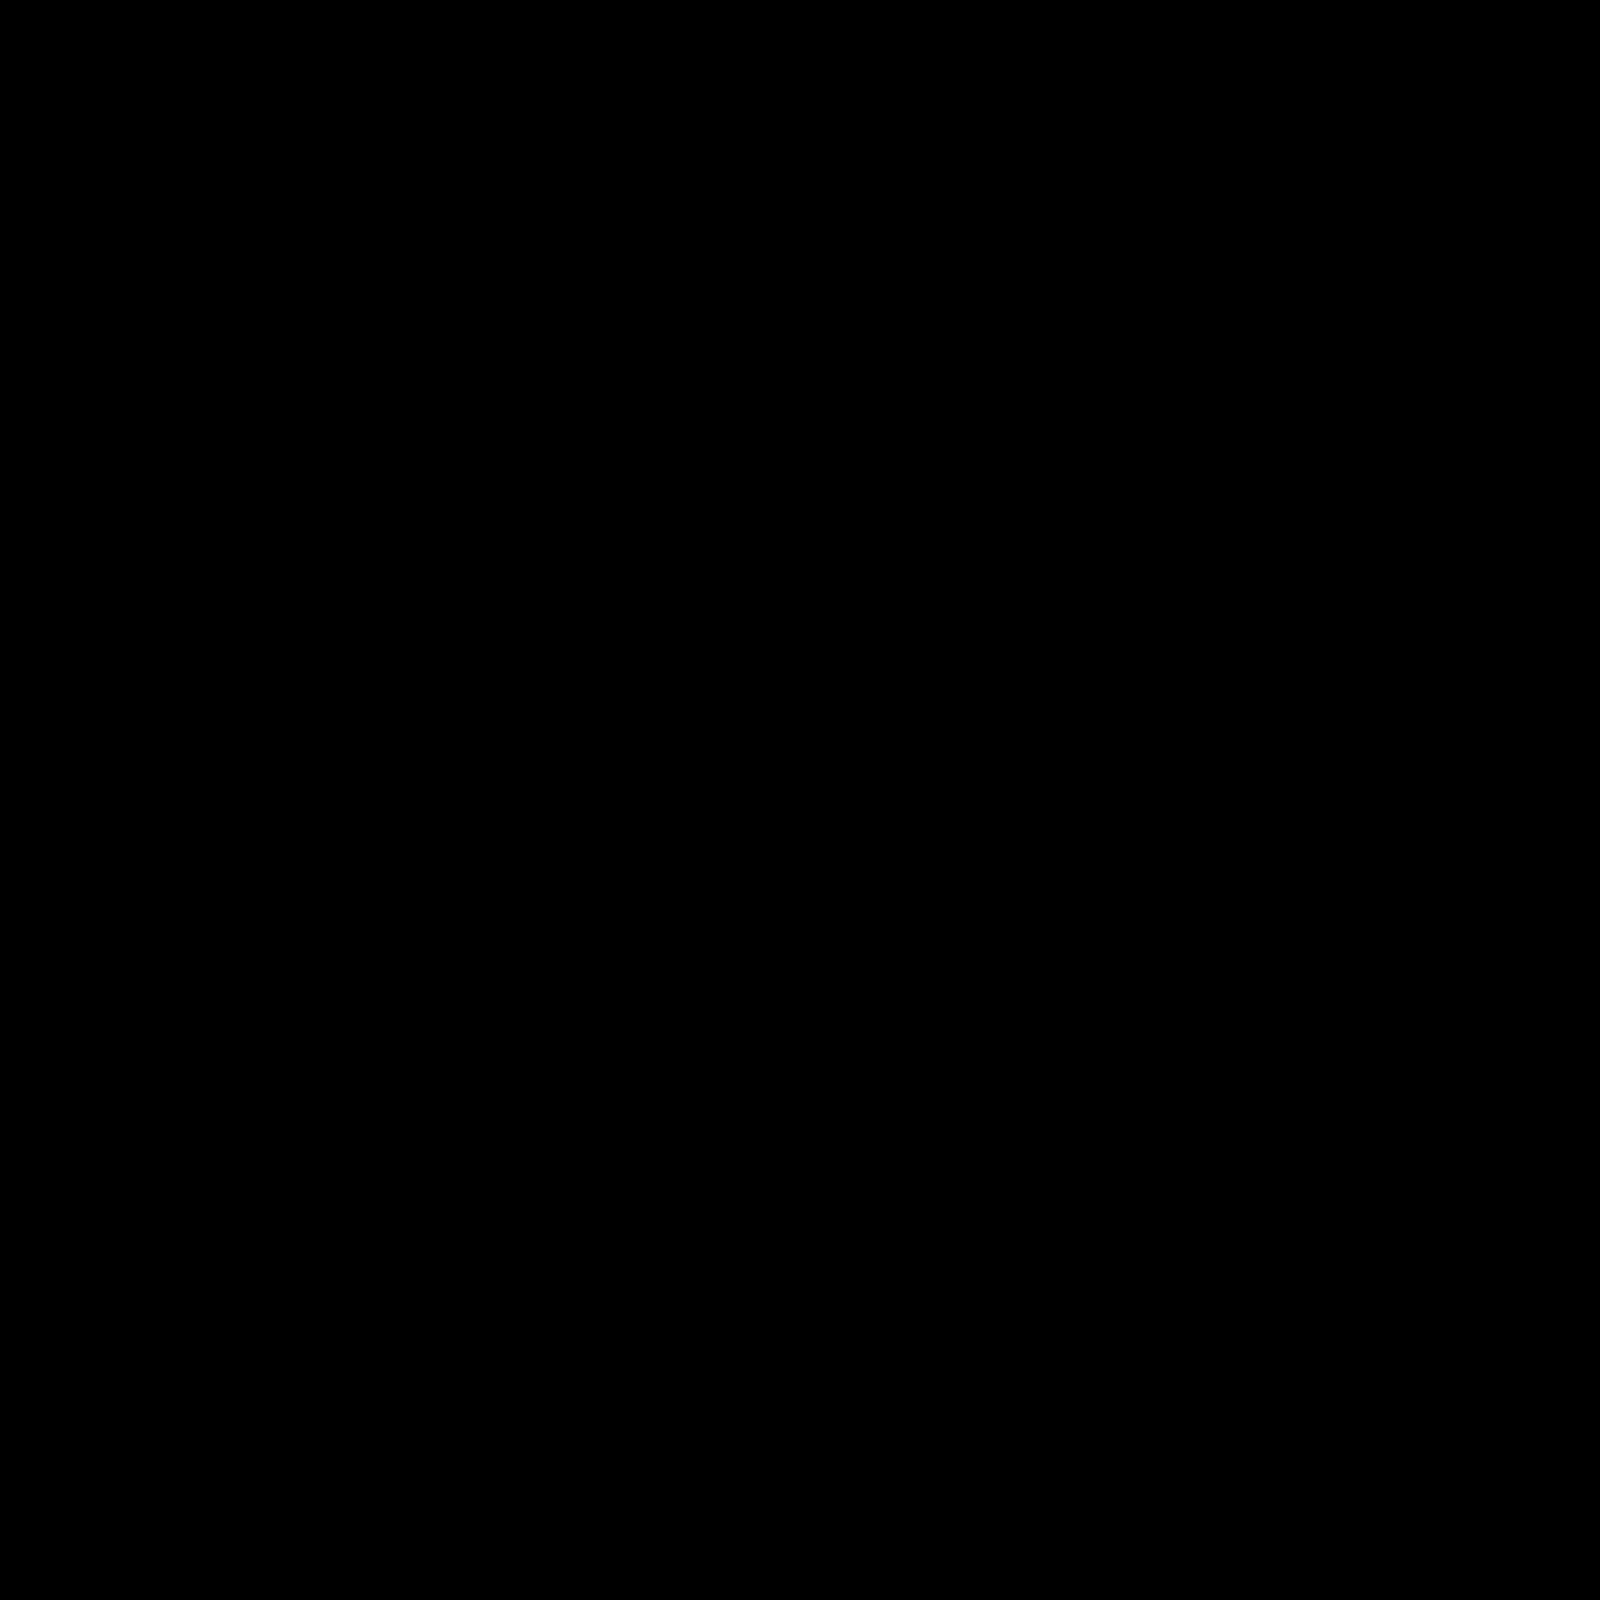 New Copy icon